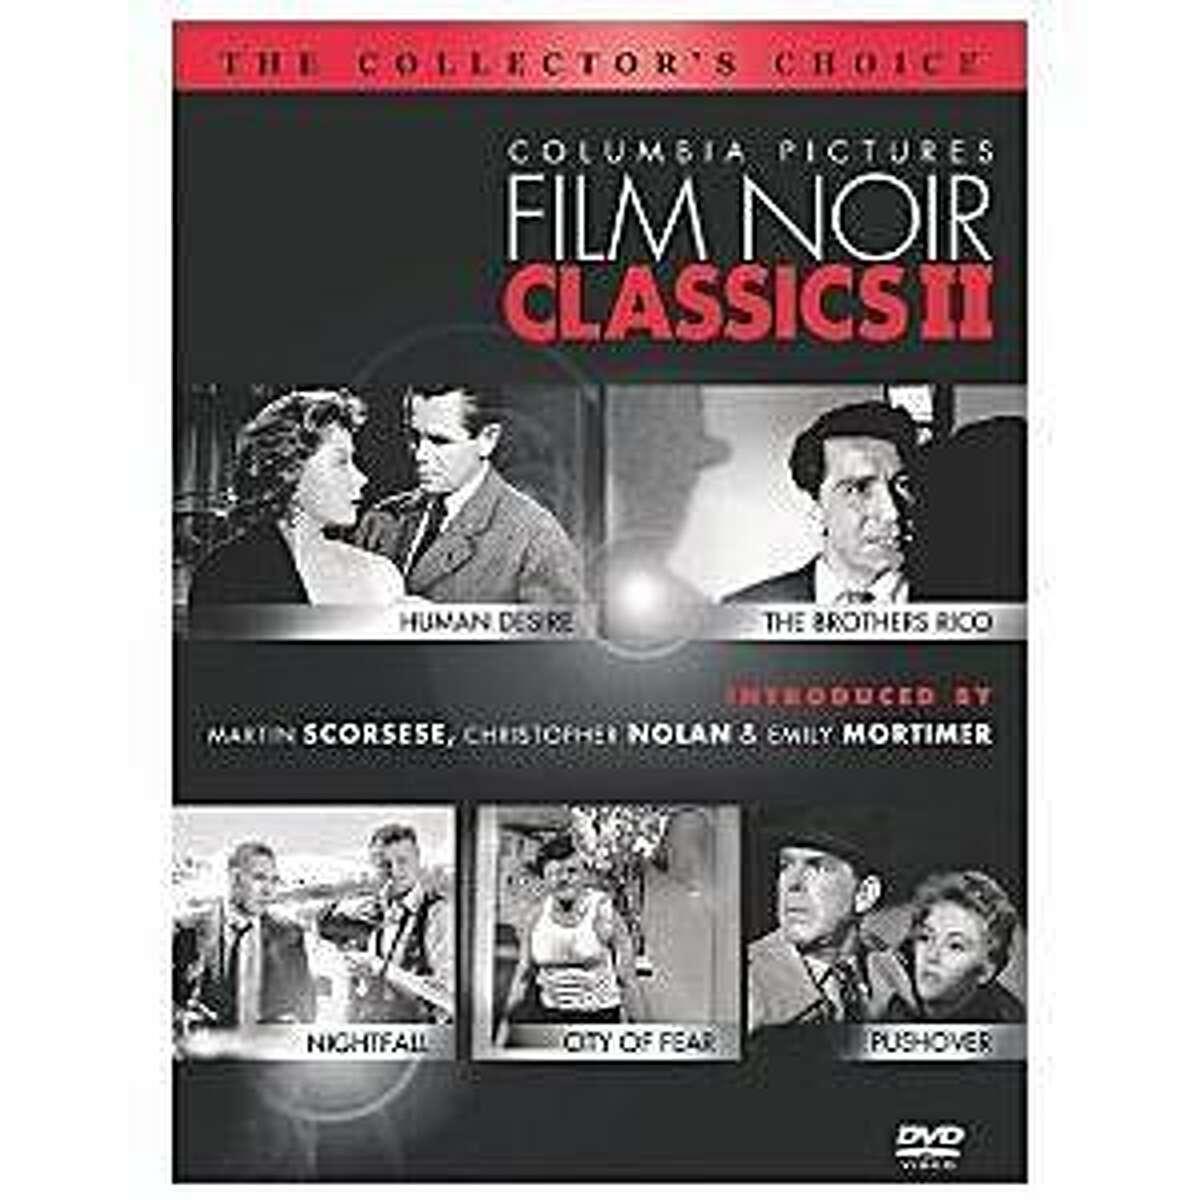 dvd cover COLUMBIA PICTURES FILM NOIR CLASSICS II